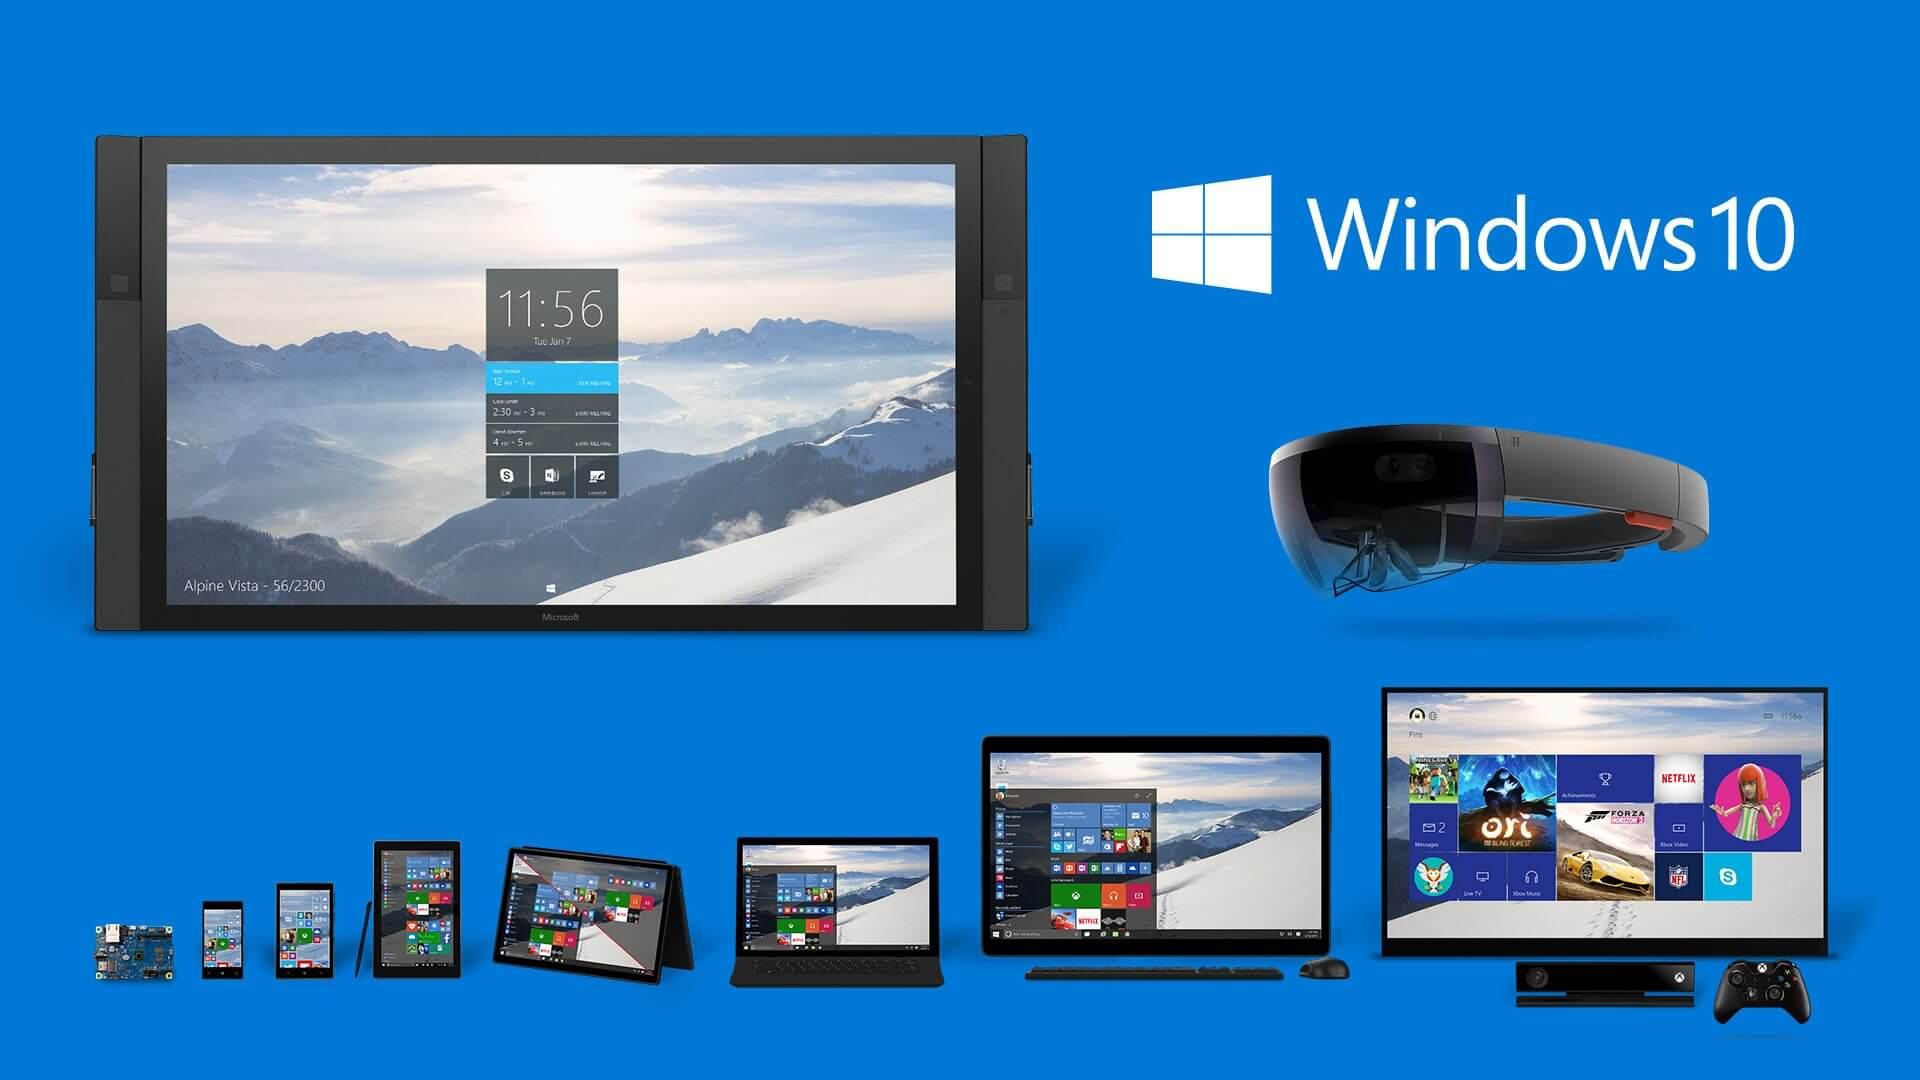 smt-windowsinsider-W10